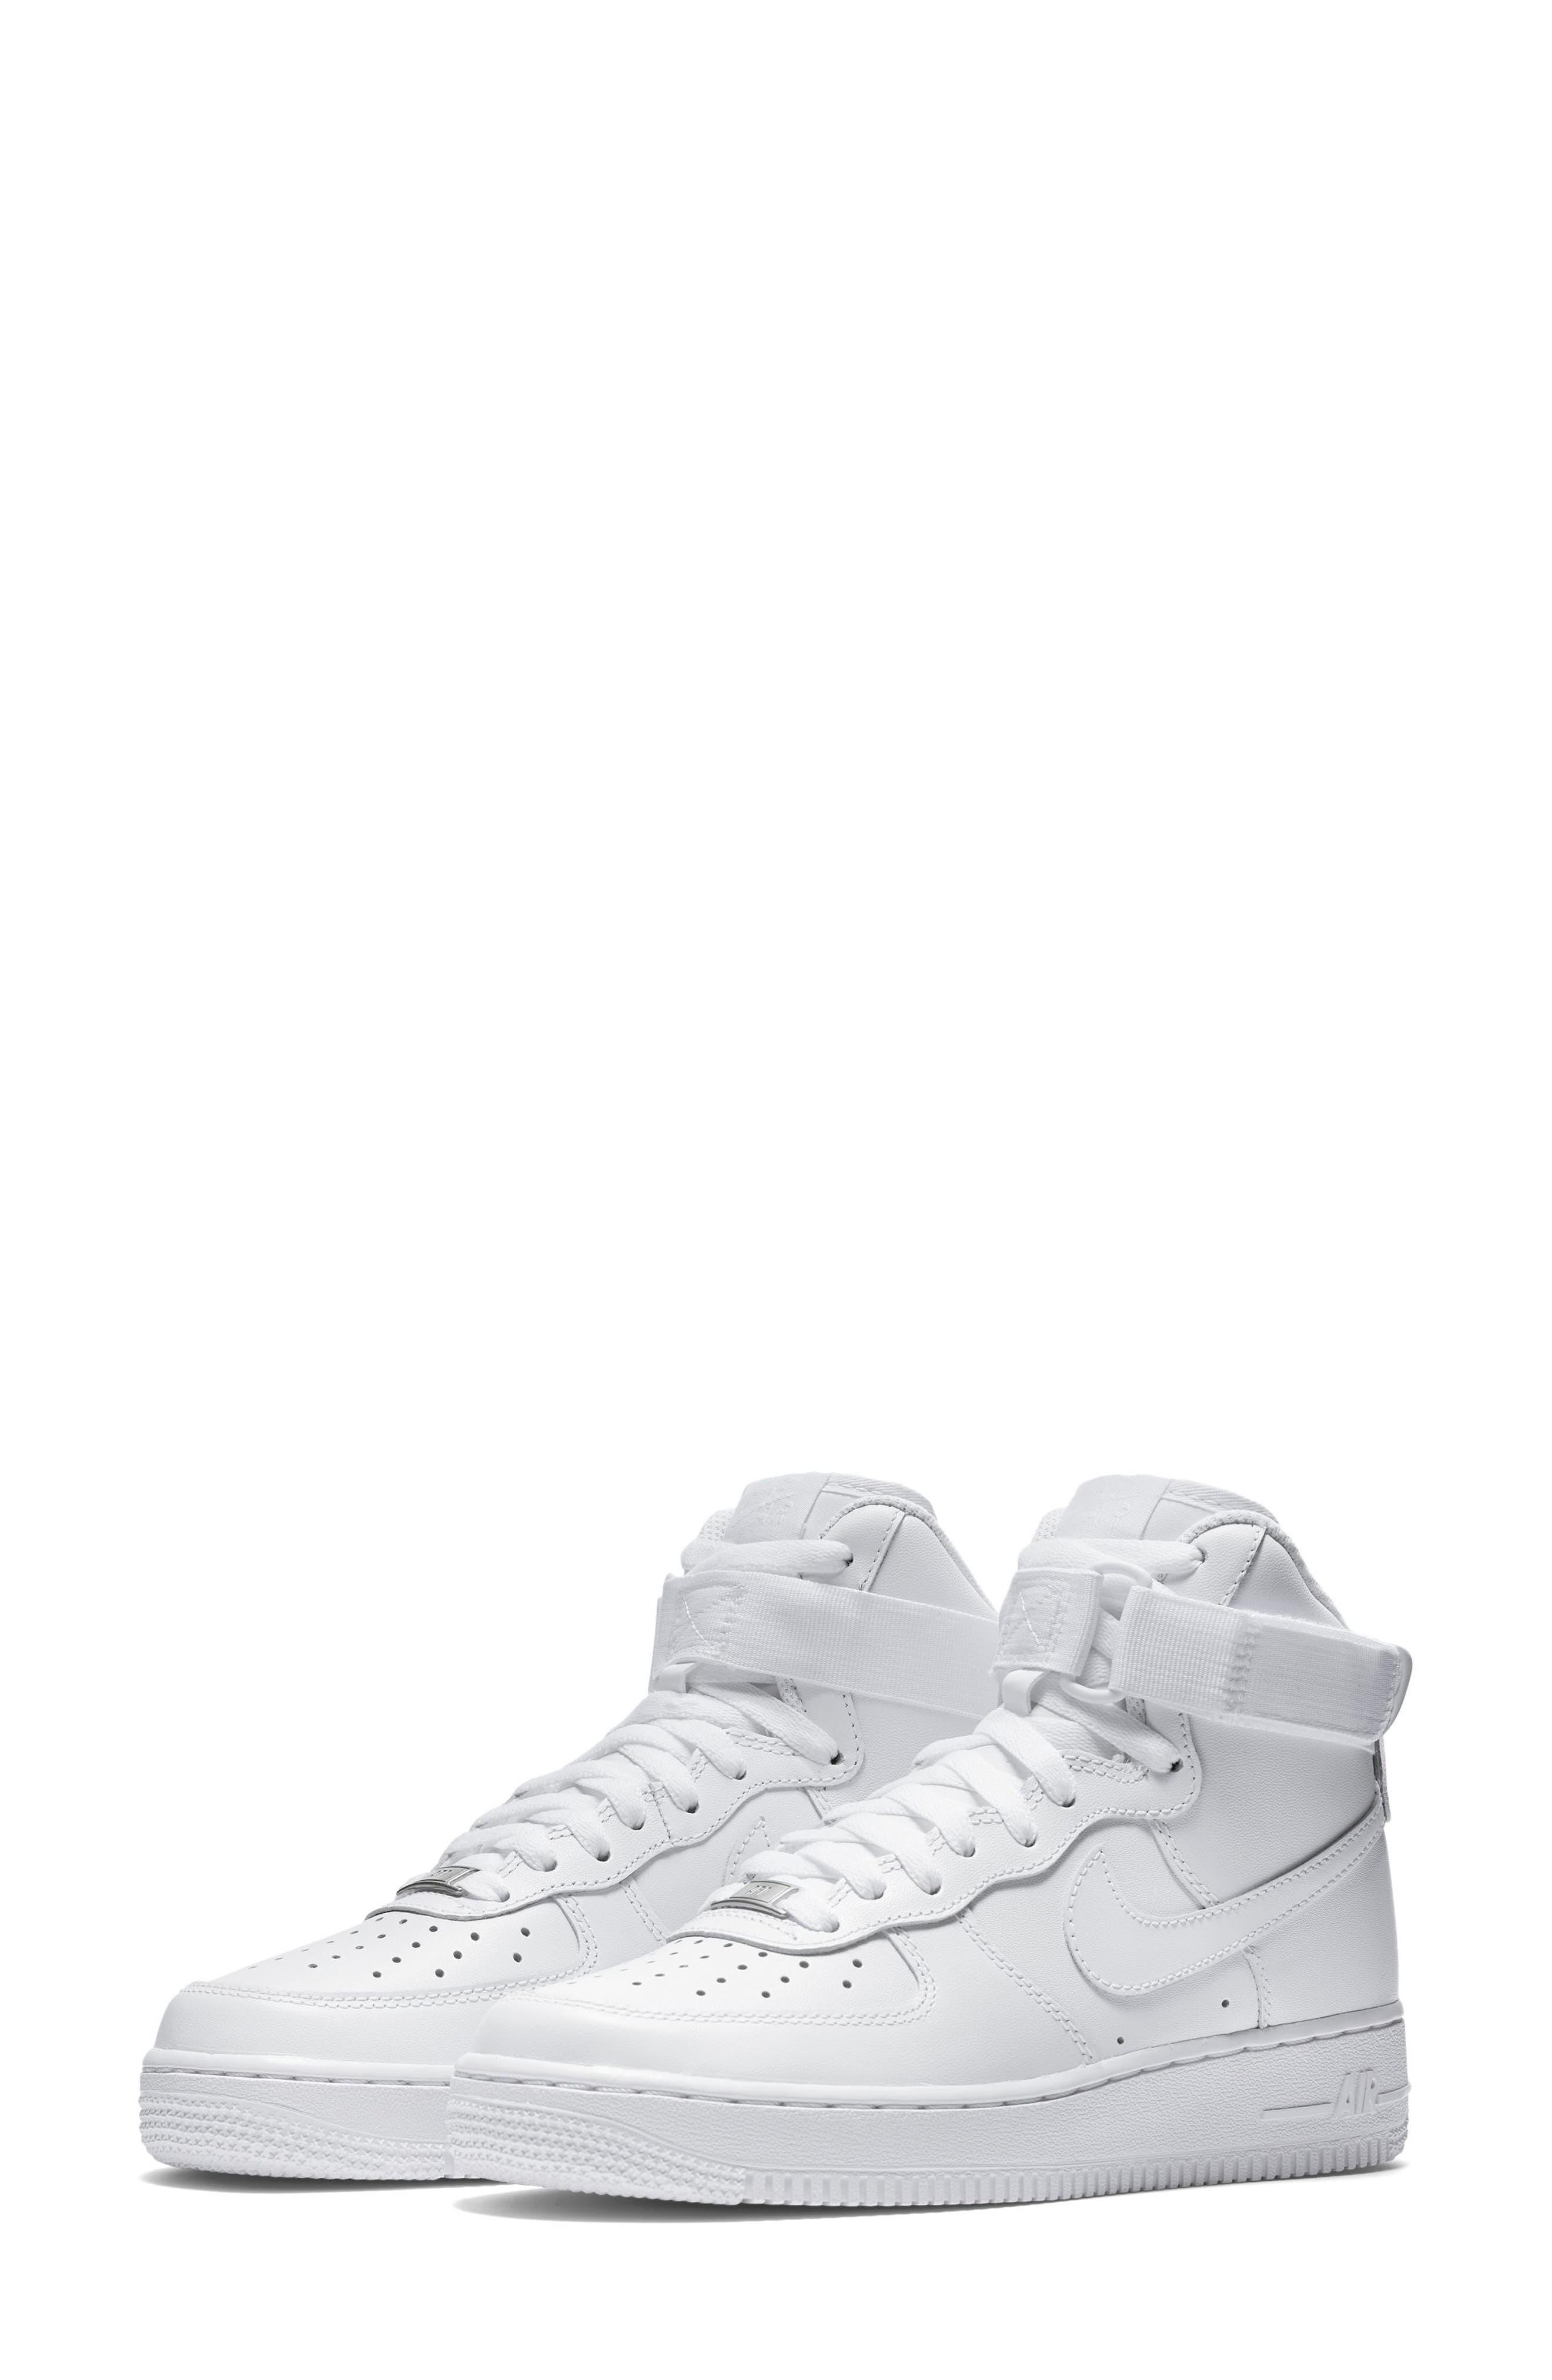 NIKE, Air Force 1 High Top Sneaker, Main thumbnail 1, color, WHITE/ WHITE/ WHITE